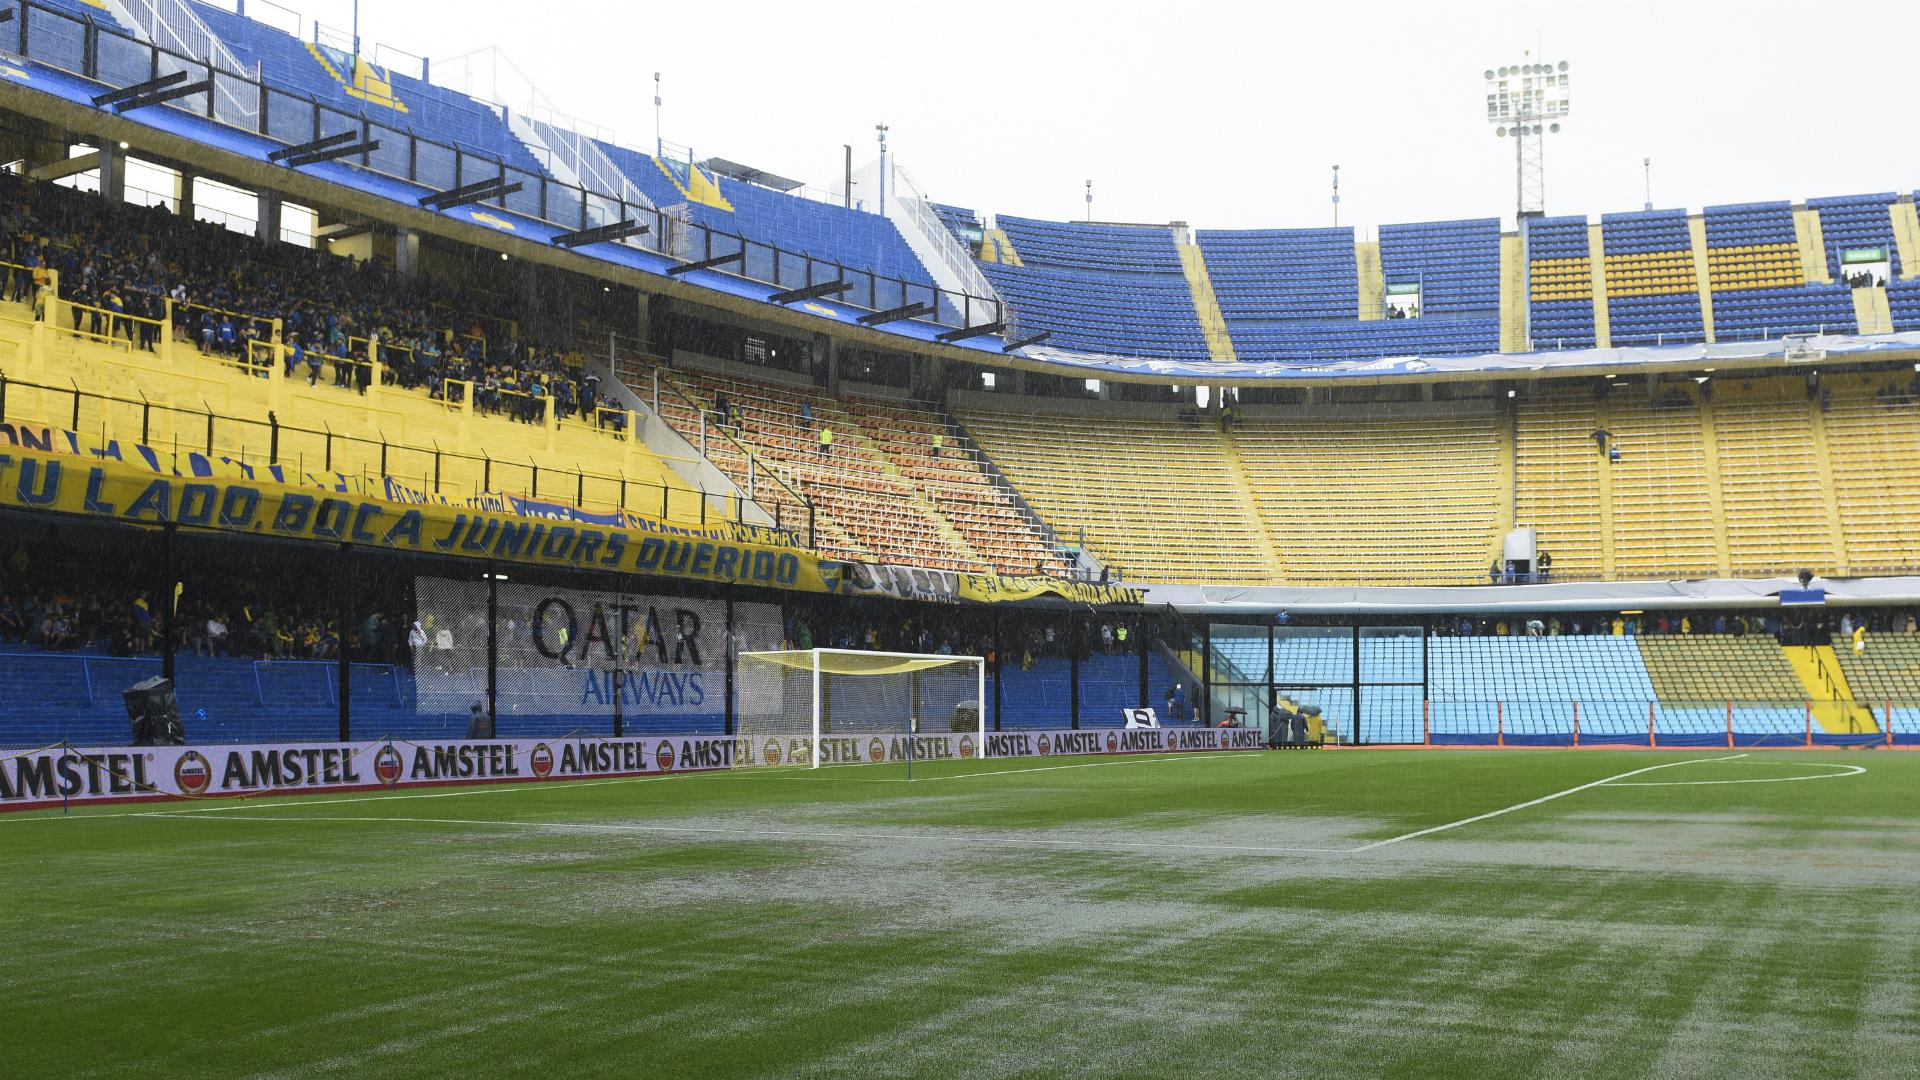 La Bombonera Boca Juniors River Plate Superclasico suspendido Copa Libertadores 10112018